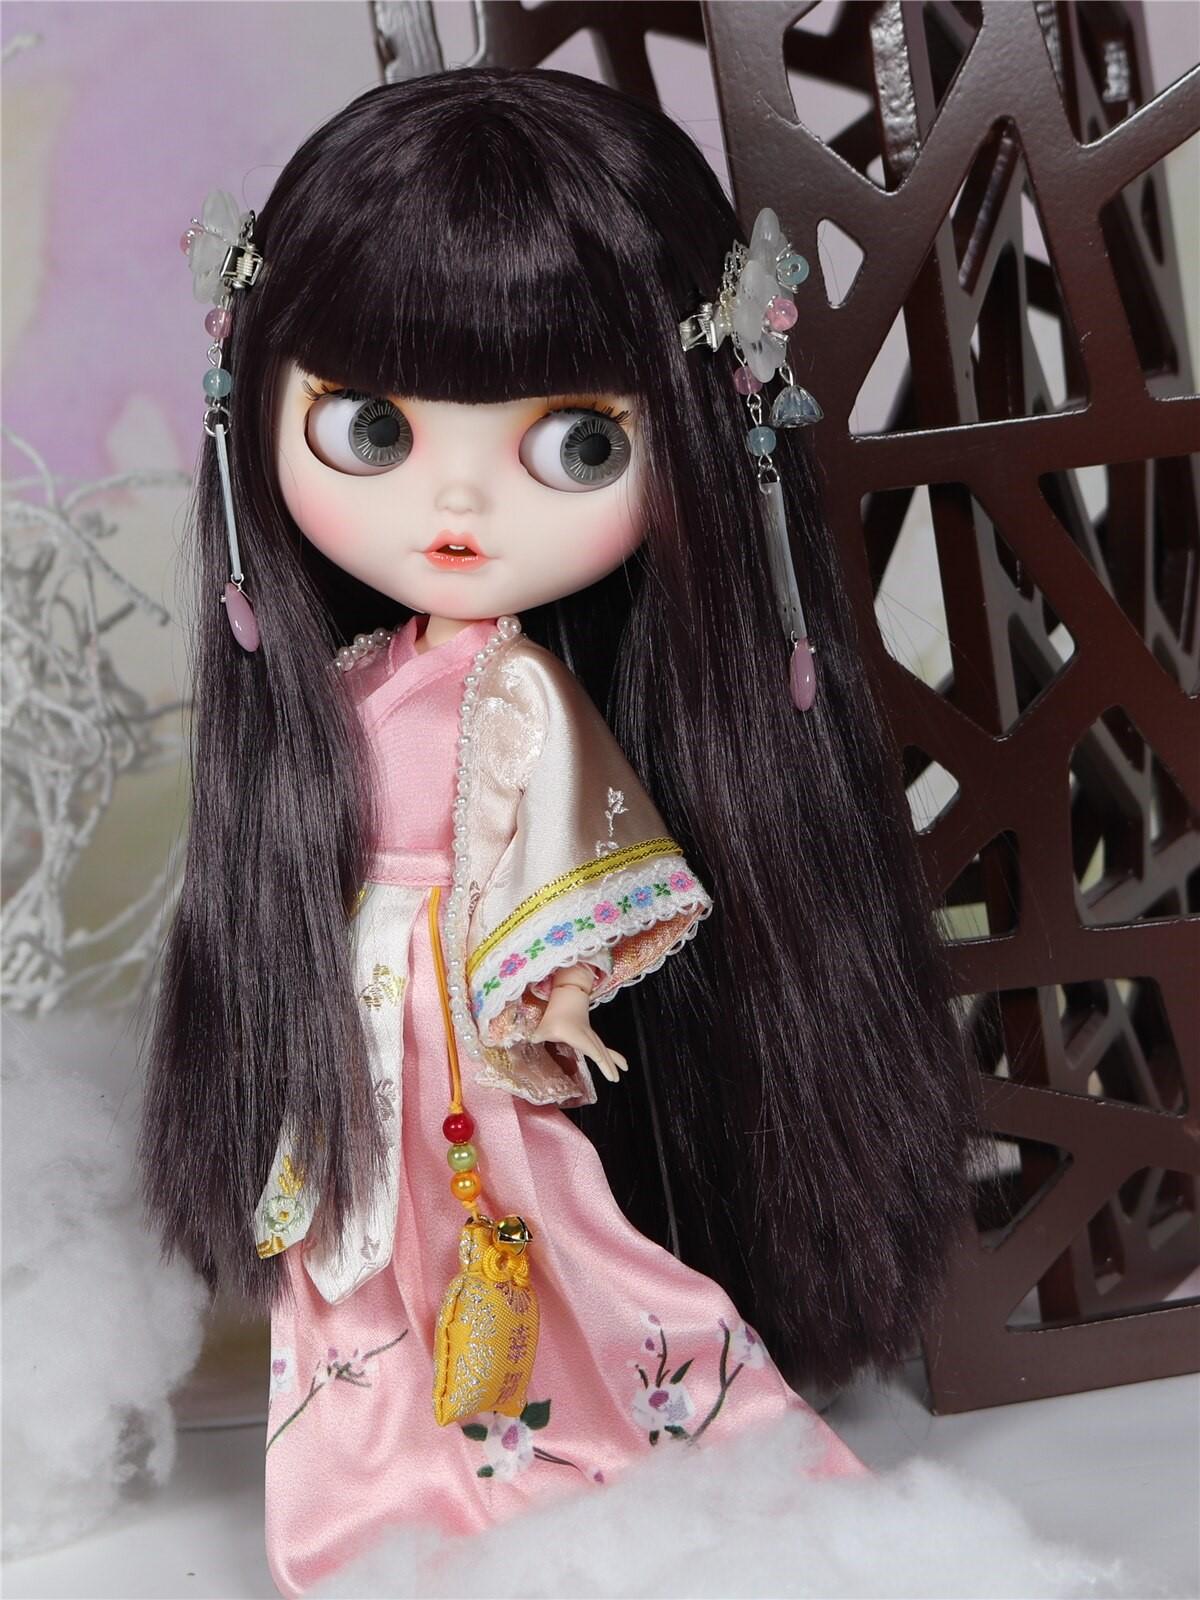 Miriam – Premium Custom Blythe Doll with Clothes Smiling Face Premium Blythe Dolls 🆕 Smiling Face